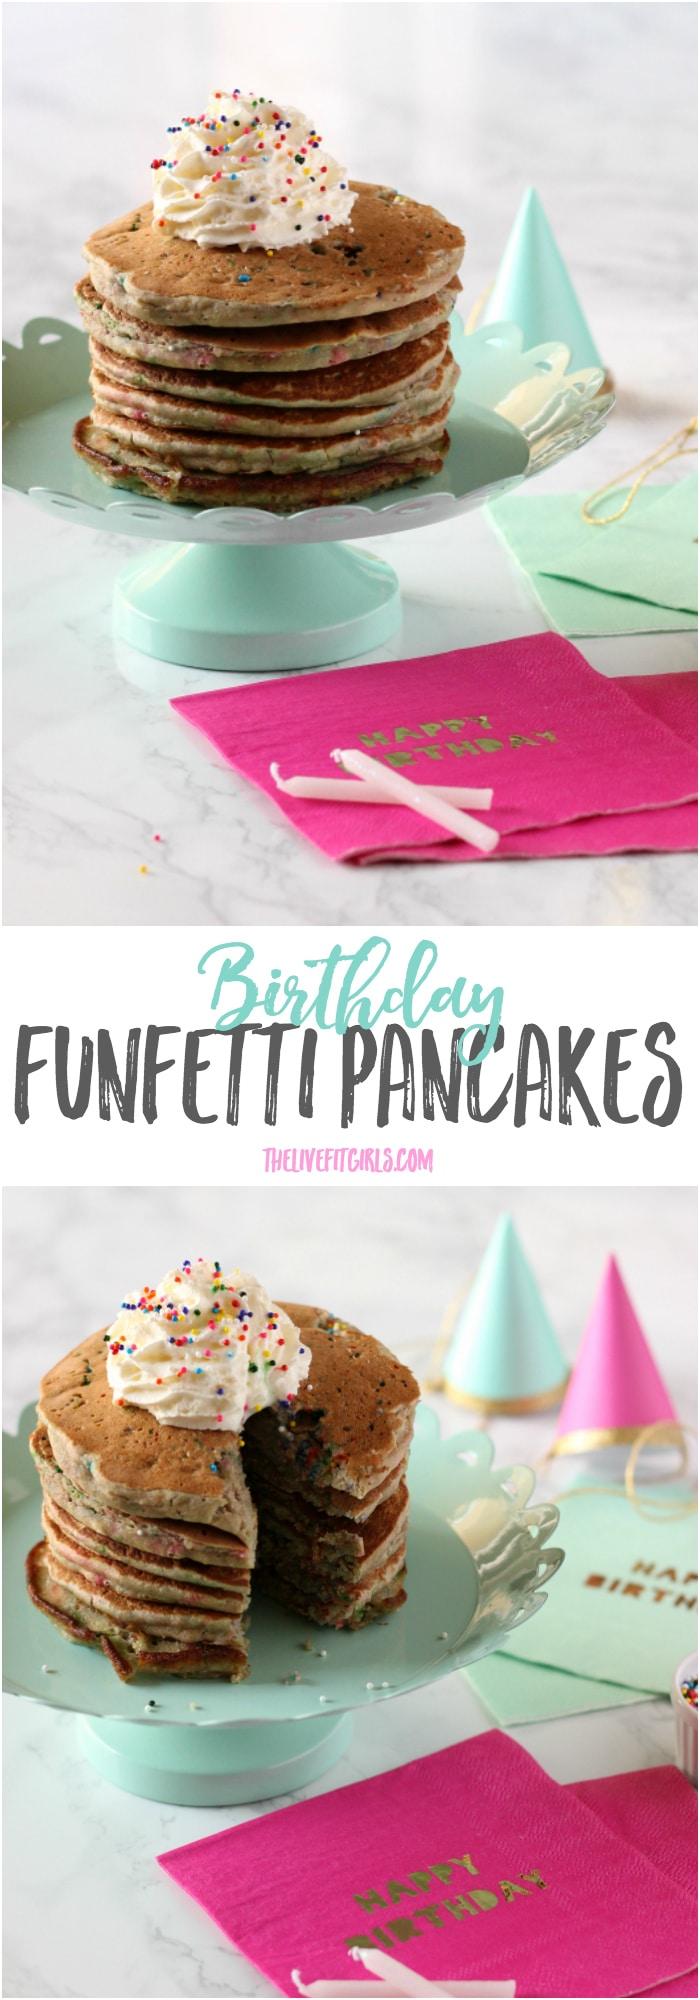 funfetti-pancakes-pin